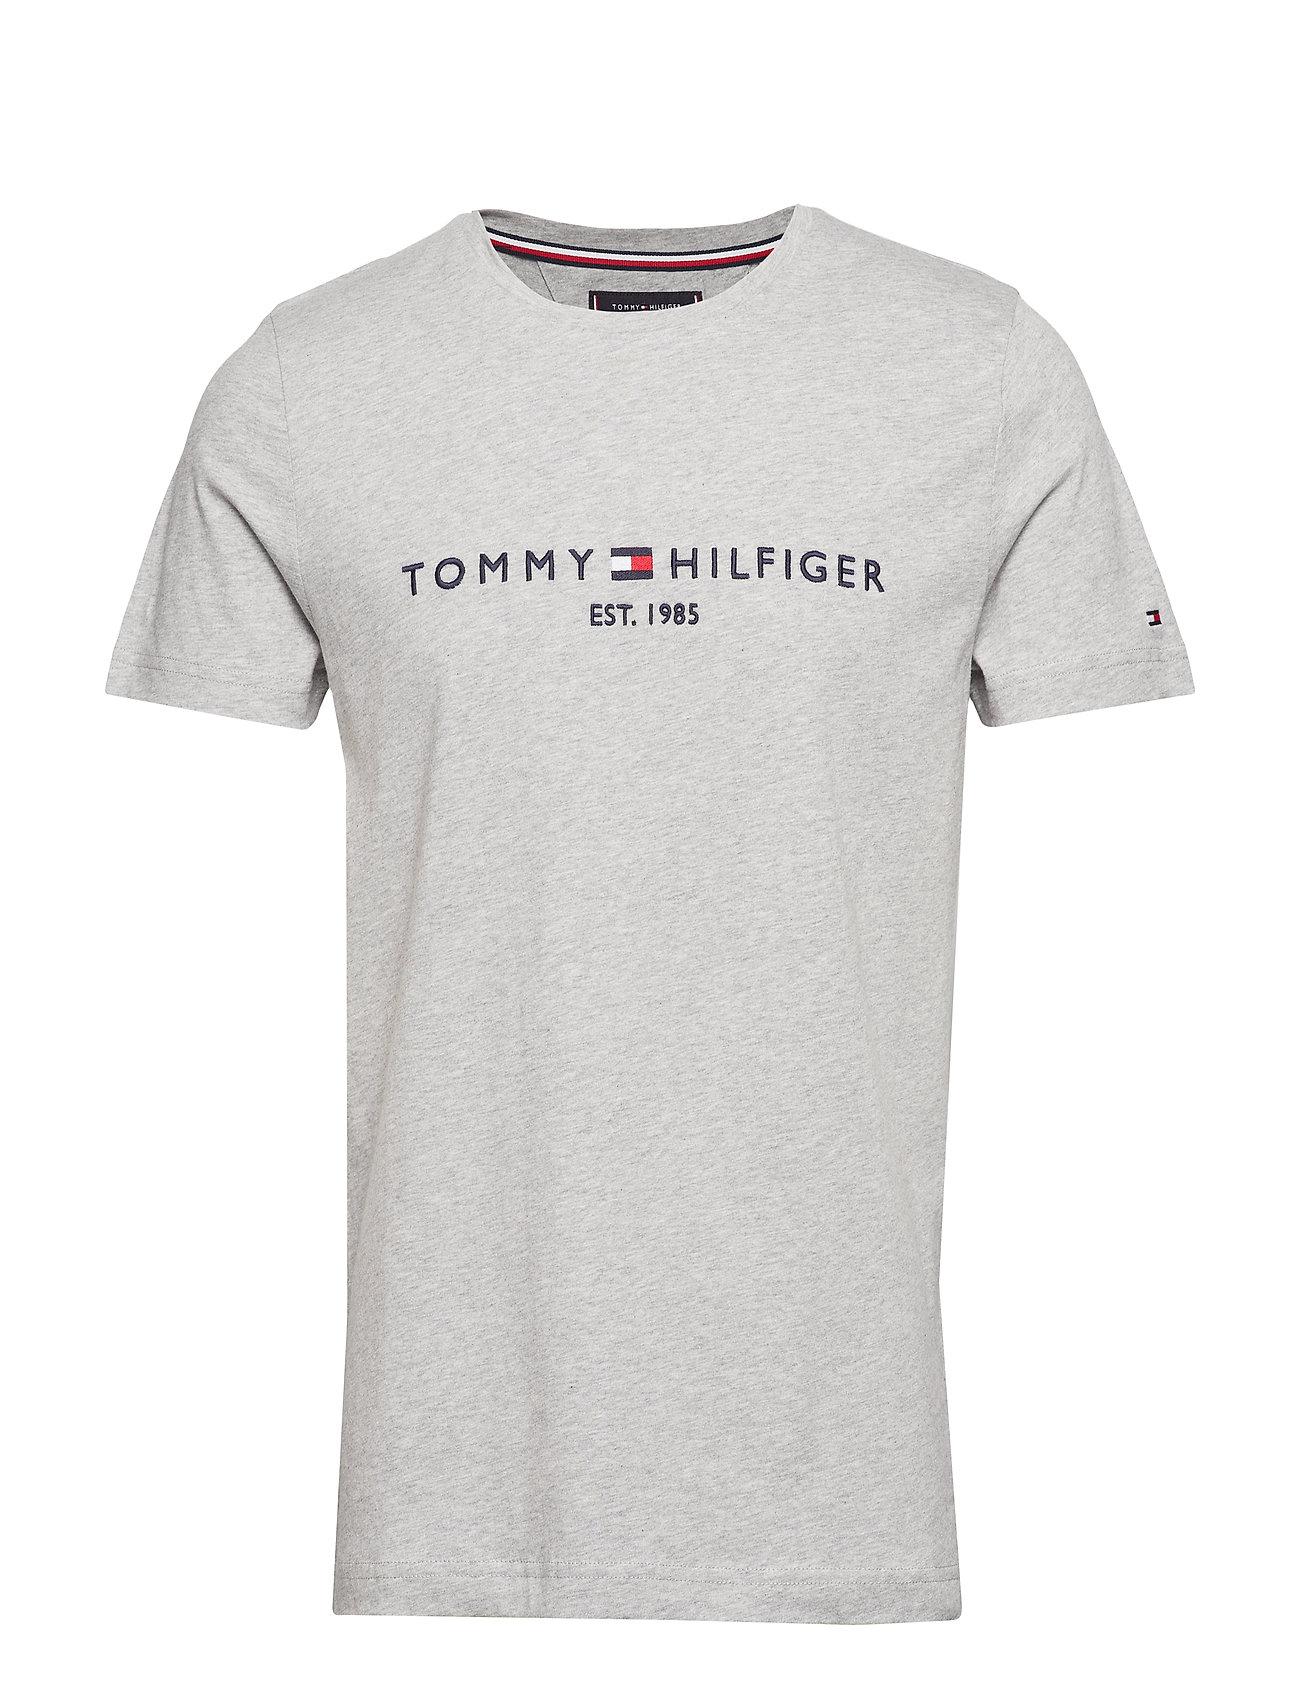 Tommy Hilfiger TOMMY LOGO TEE - CLOUD HTR